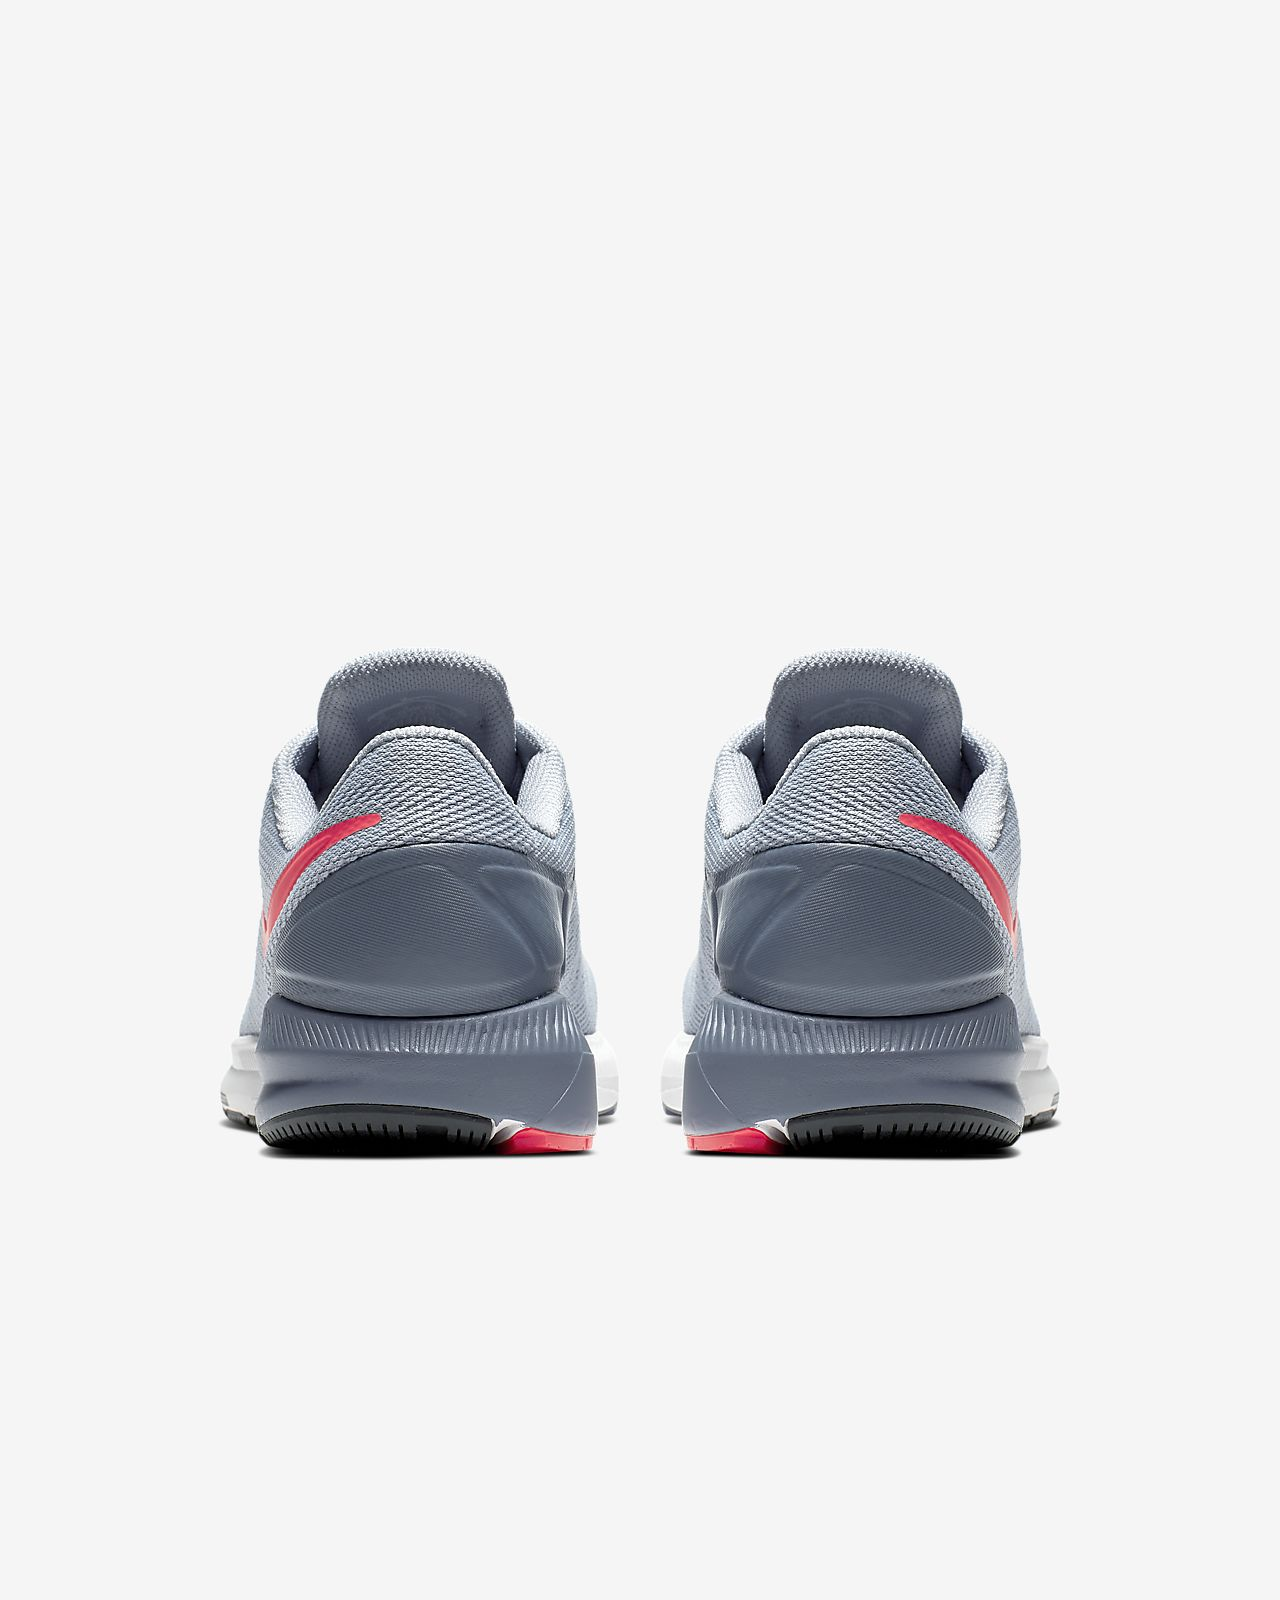 3318942c238c Nike Air Zoom Structure 22 Men s Running Shoe. Nike.com CA